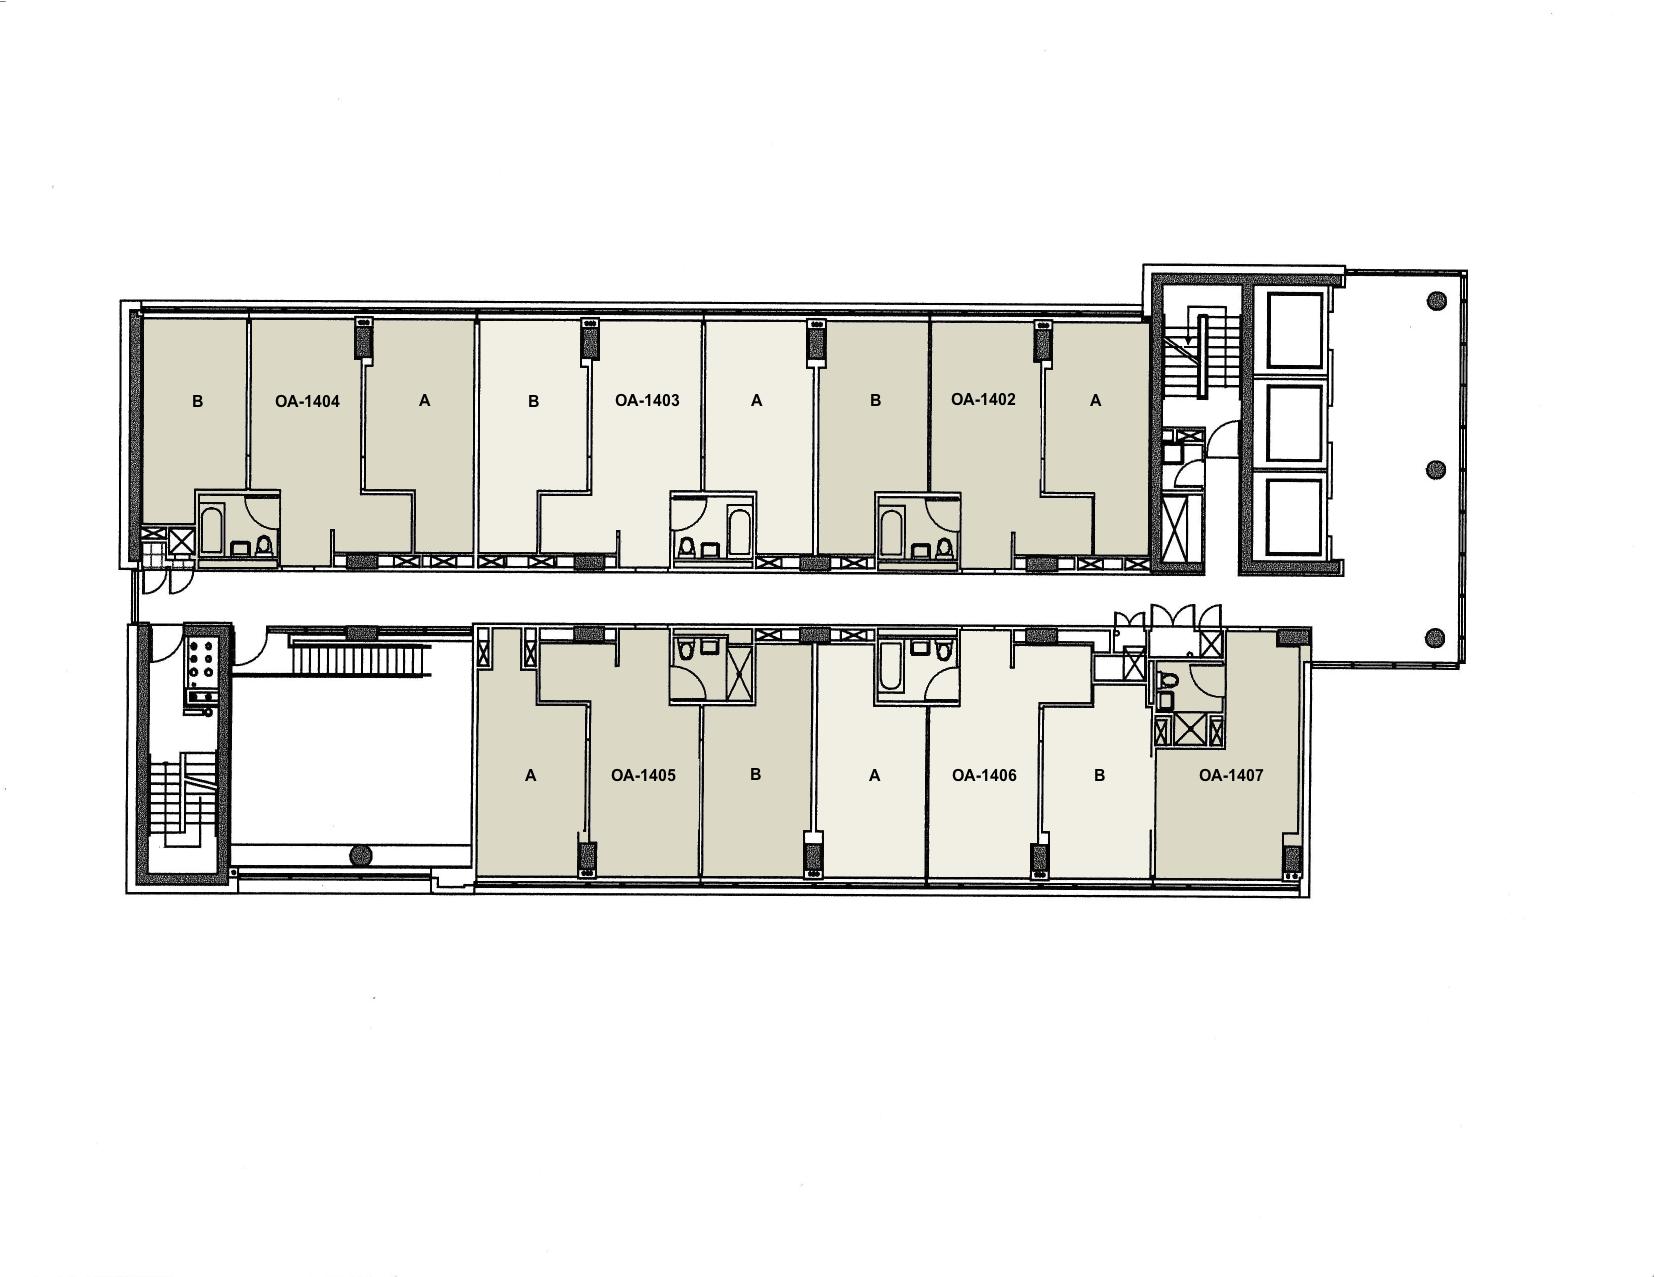 Nyu Residence Halls